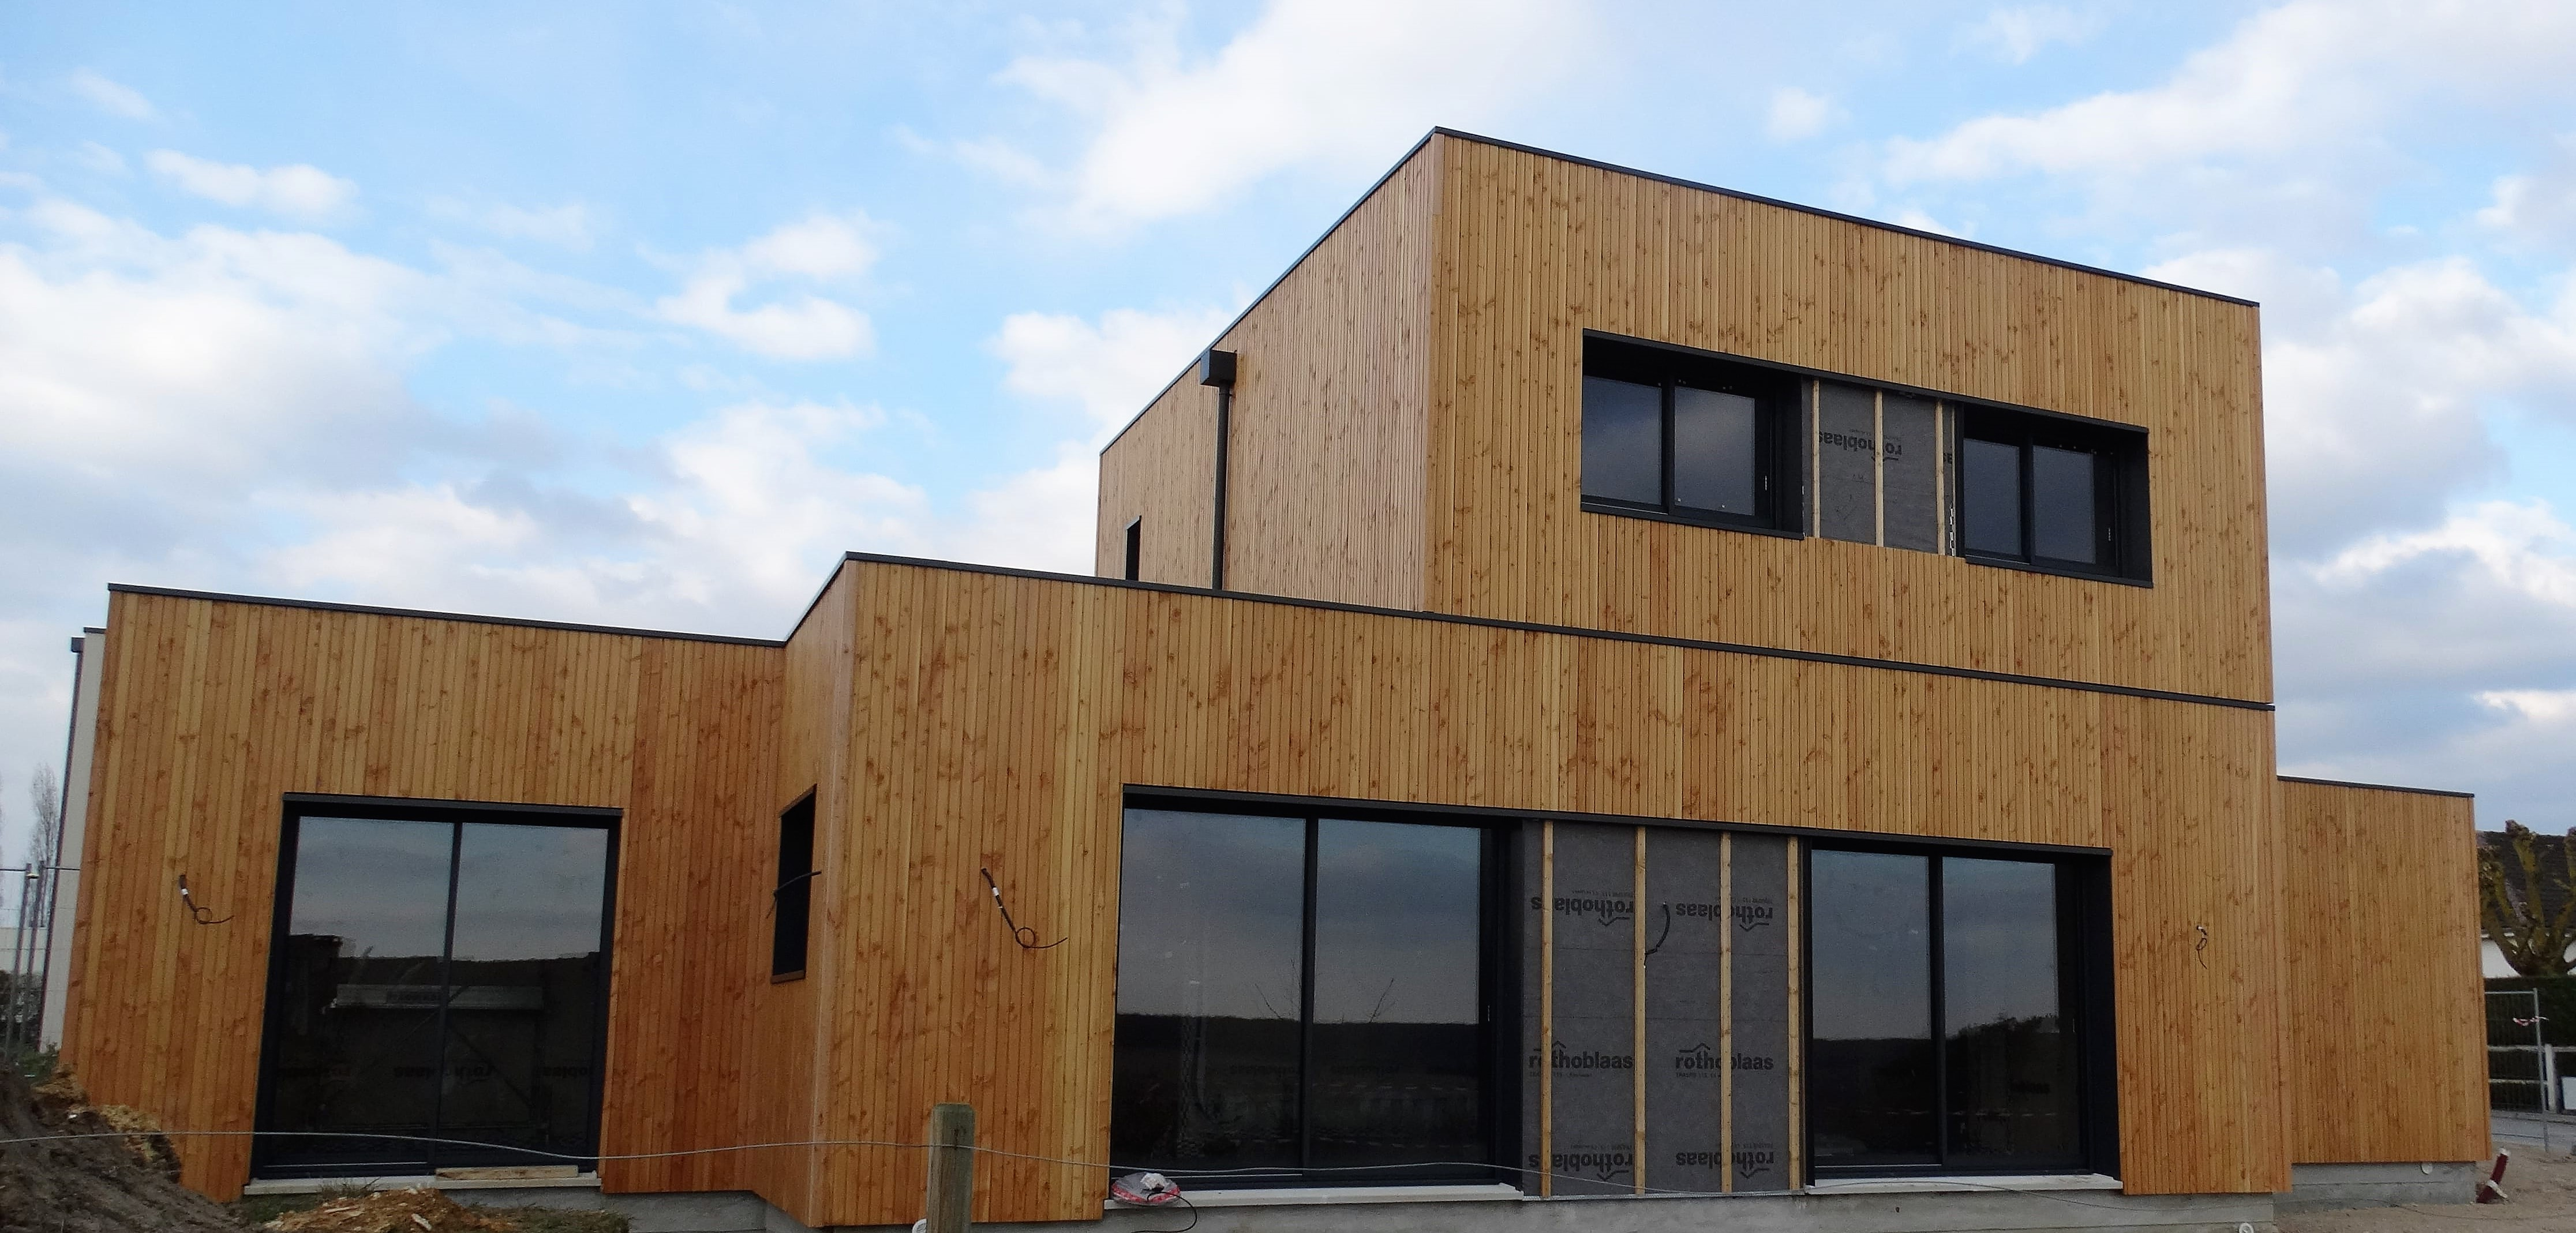 bois et design 78 habitat poulingue. Black Bedroom Furniture Sets. Home Design Ideas